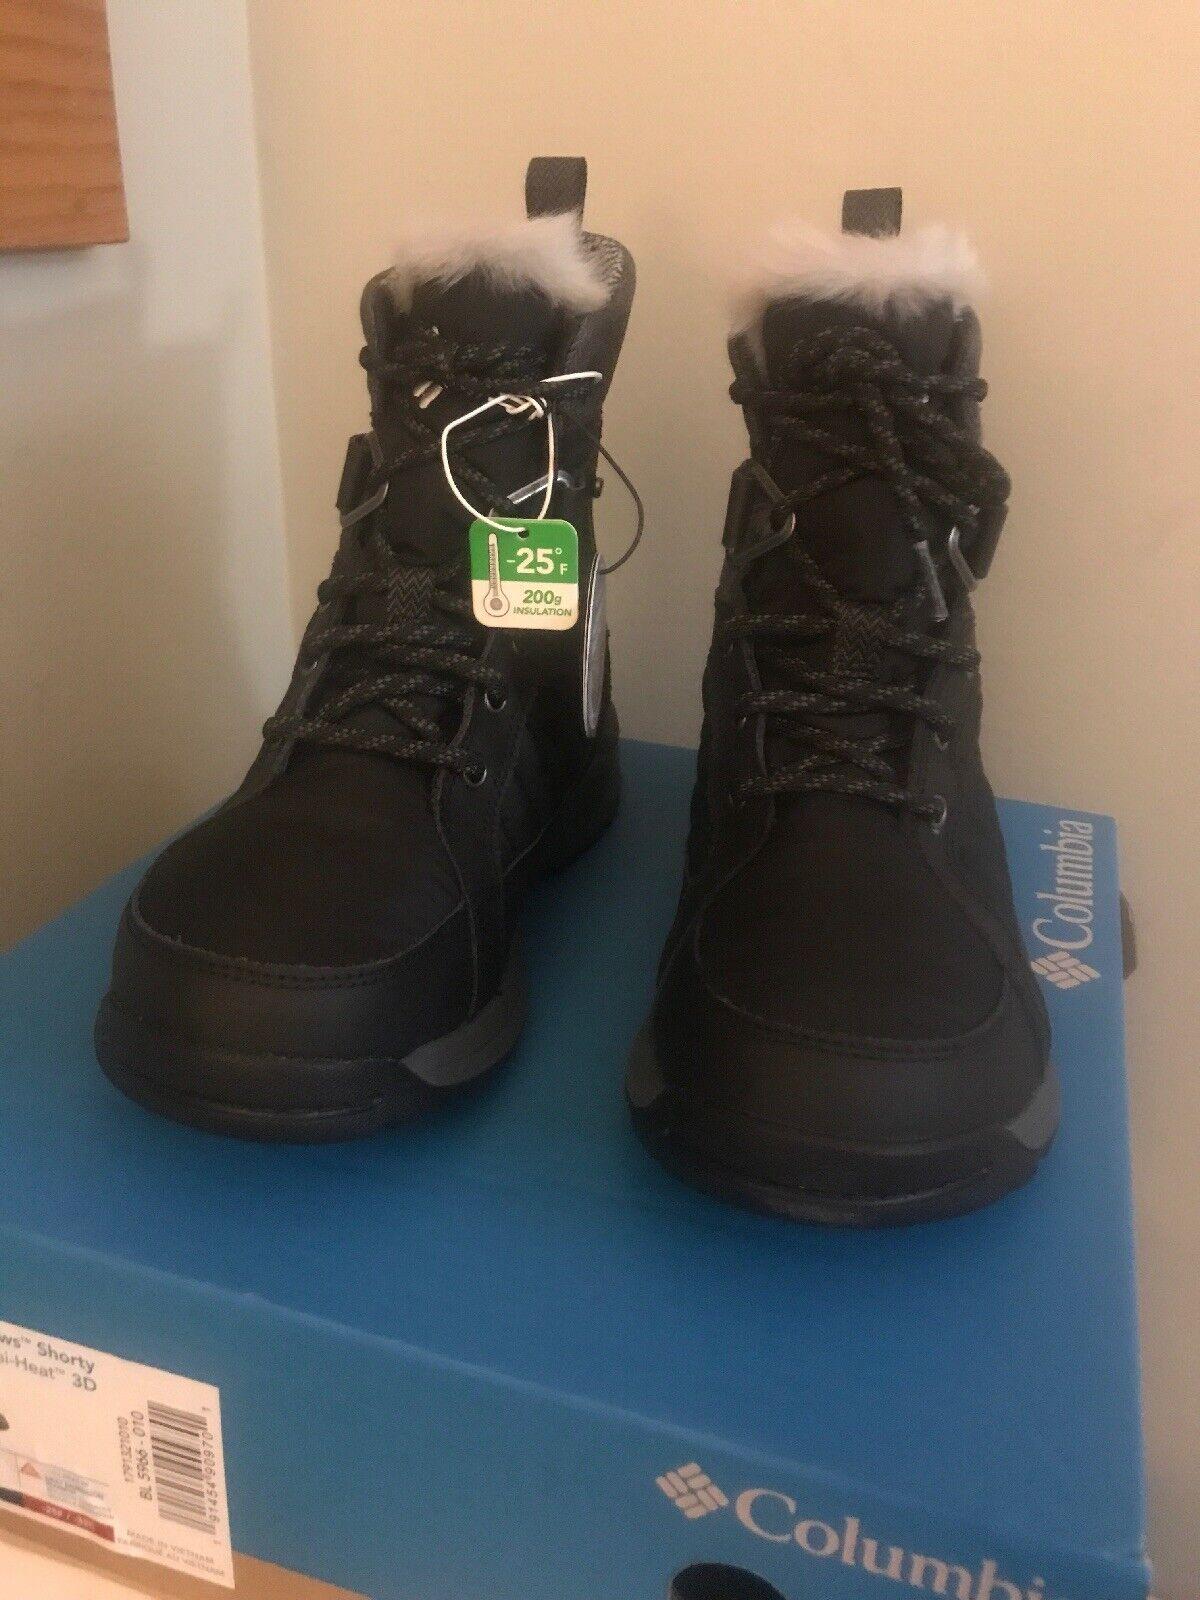 NIB Columbia Women's Meadows Shorty Omni-Heat 3D Mid Calf Boot, Black, Steam 7.5